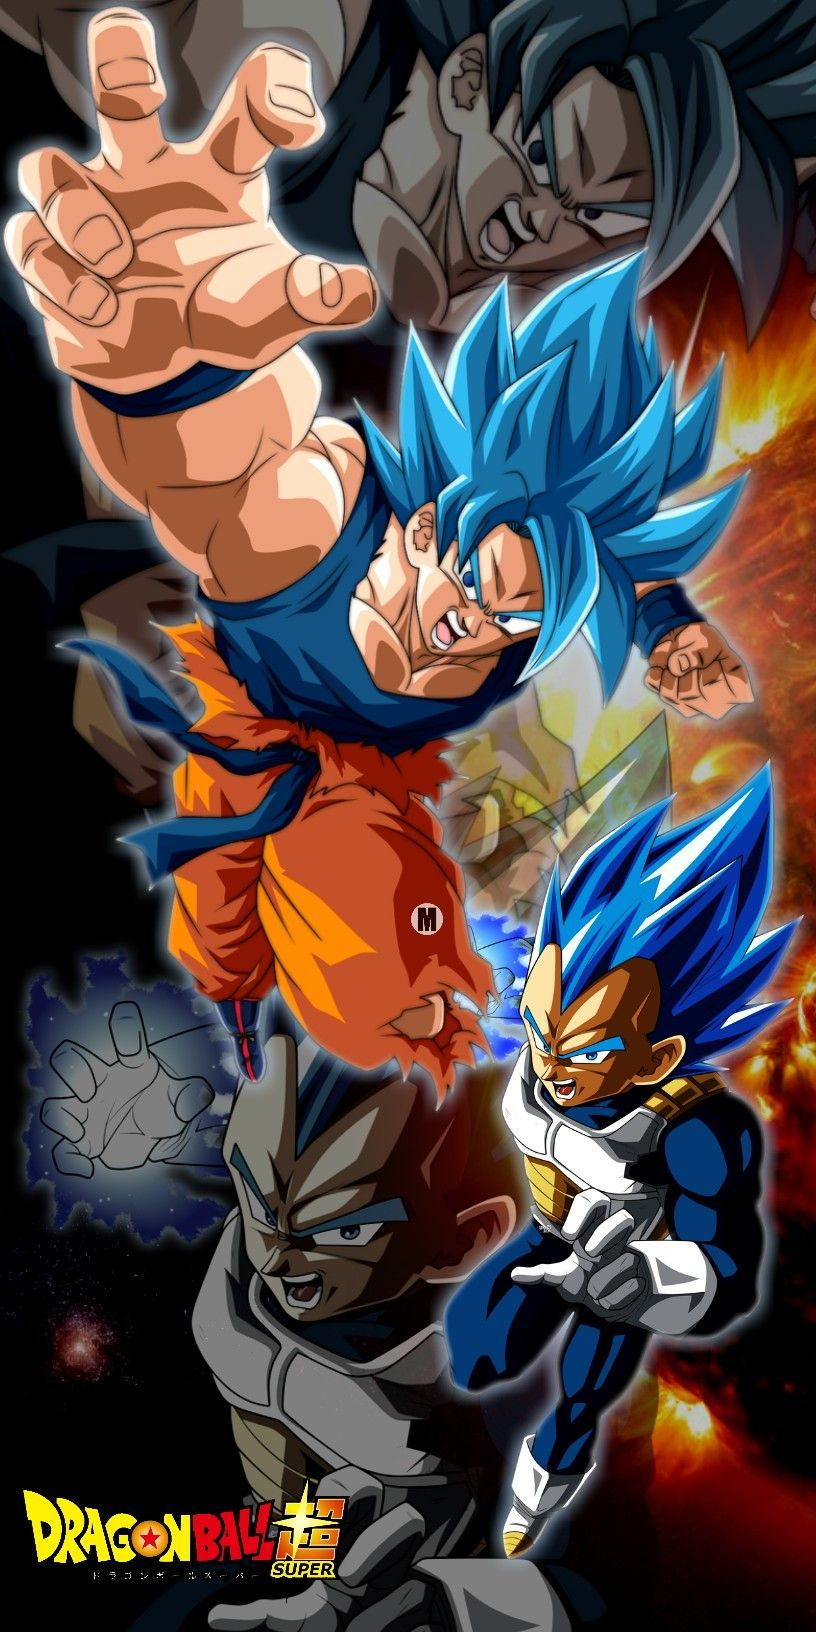 Pin By Orlando Rodriguez On Art Anime Dragon Ball Super Dragon Ball Super Manga Dragon Ball Goku